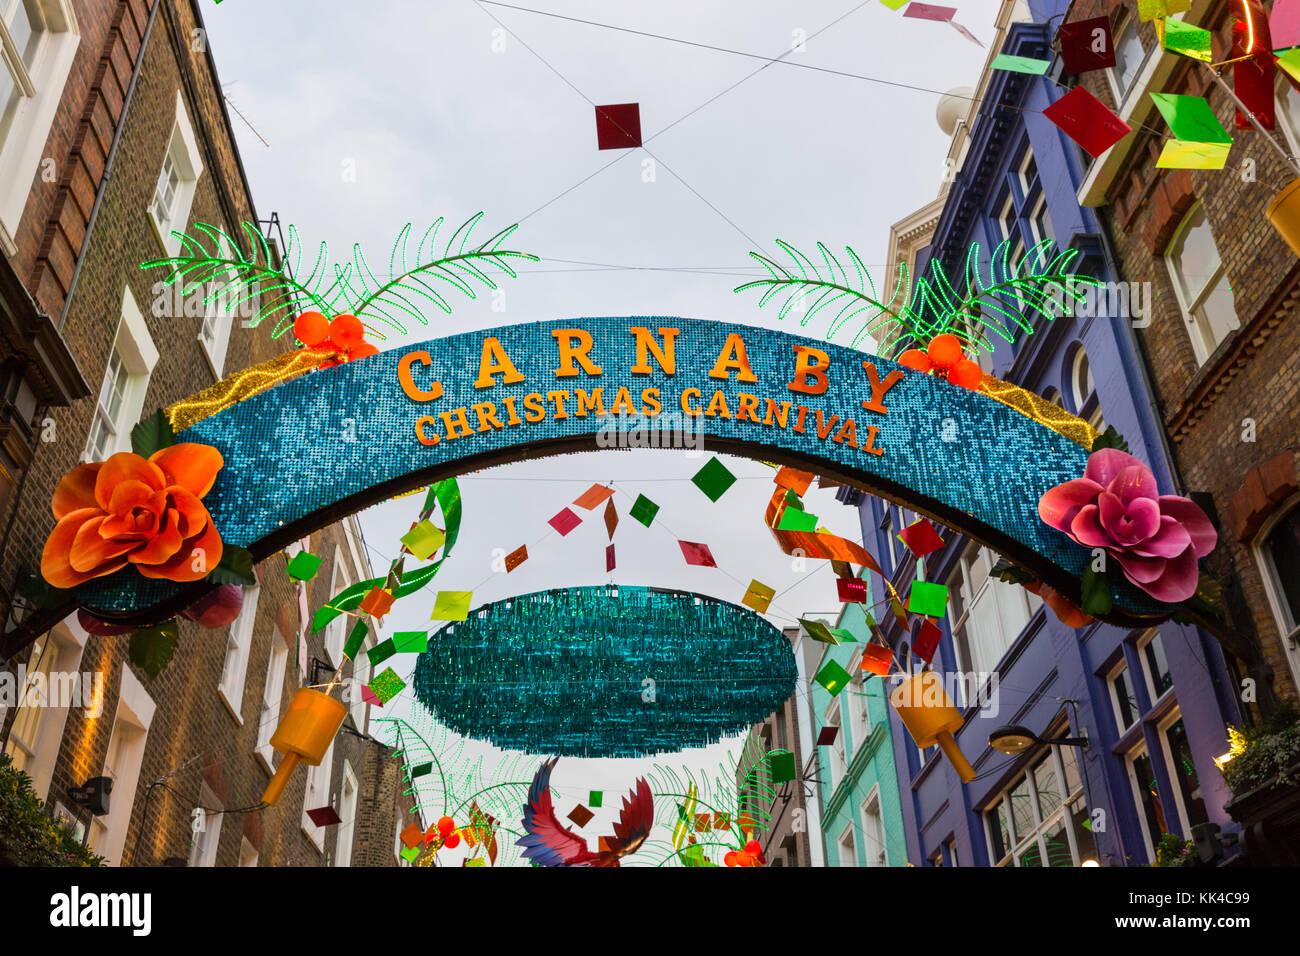 Natale a tema di Carnevale le luci di Natale 2017 in Carnaby Street, Londra Immagini Stock